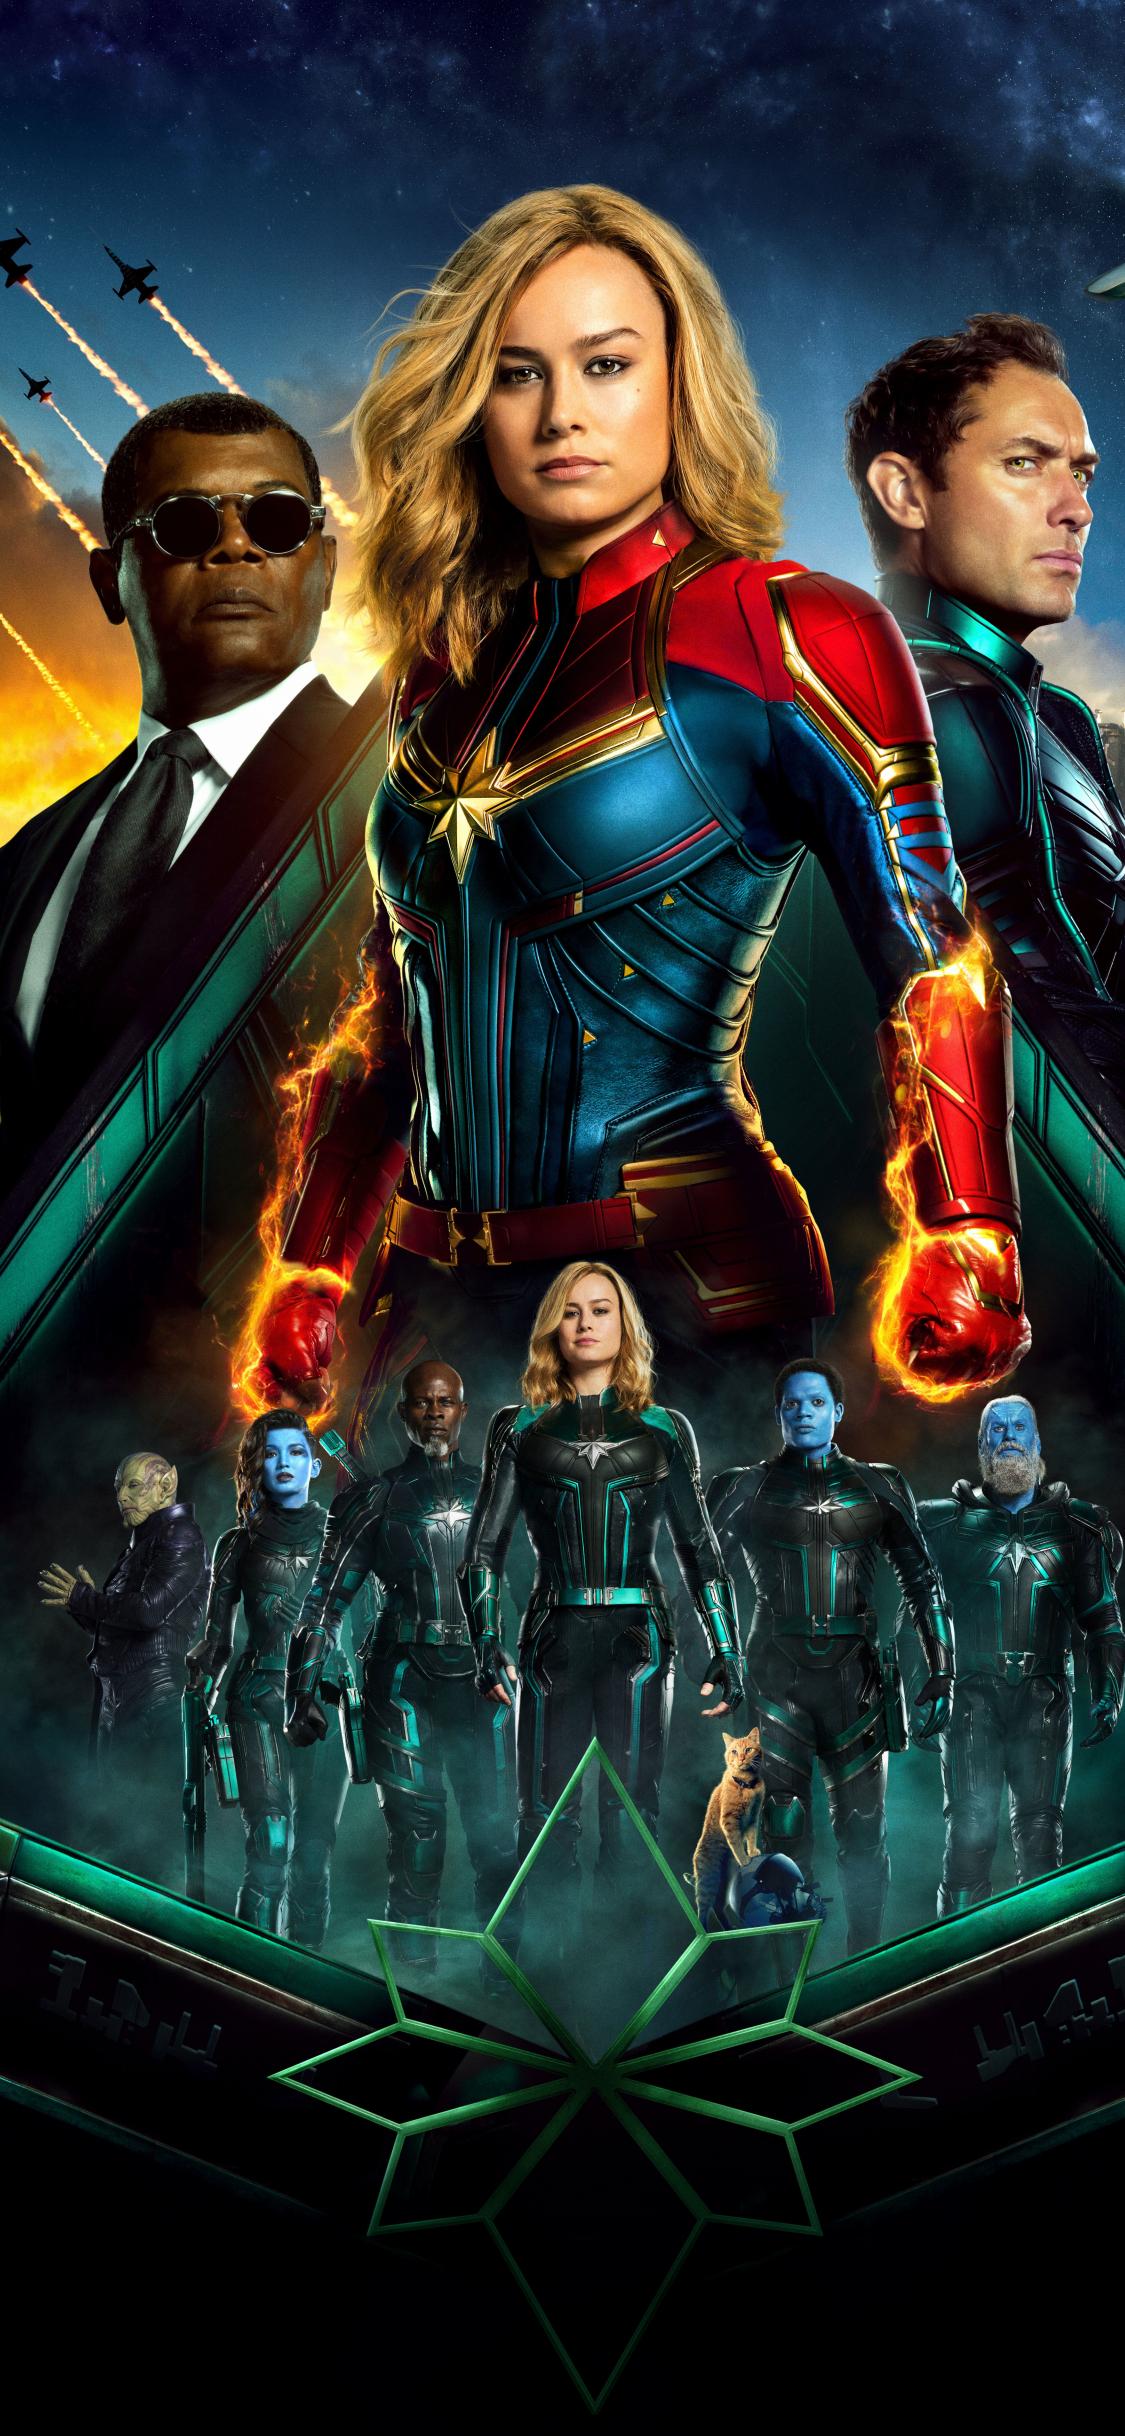 1125x2436 Captain Marvel Movie All Superheroes Iphone Xs